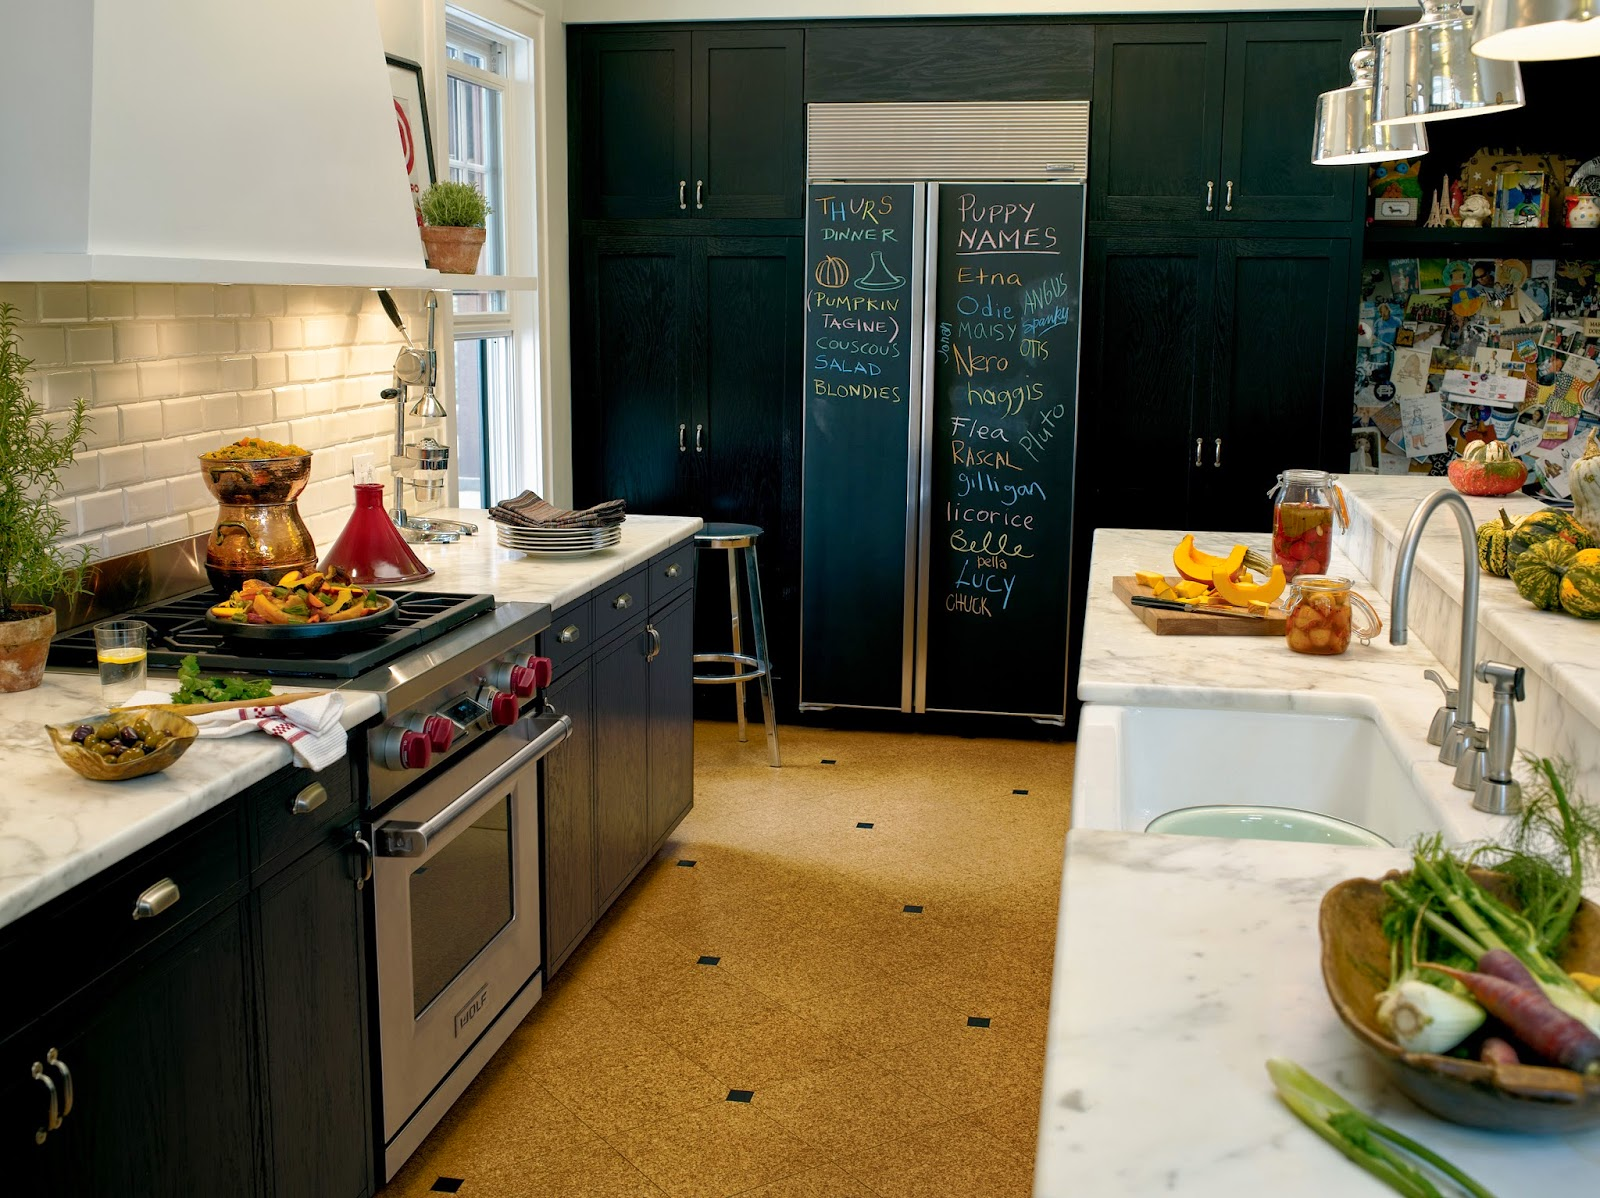 pella kitchen windows aunt jemima curtains 從近代廚具的演變歷史看台灣廚具設計的未來 下 台灣室內設計雜誌 2010年更是配備大放異彩的年代 3c 產品完全與廚房家電結合 如電爐 烤箱 蒸烤箱 冰箱等等 各式家電都能結合